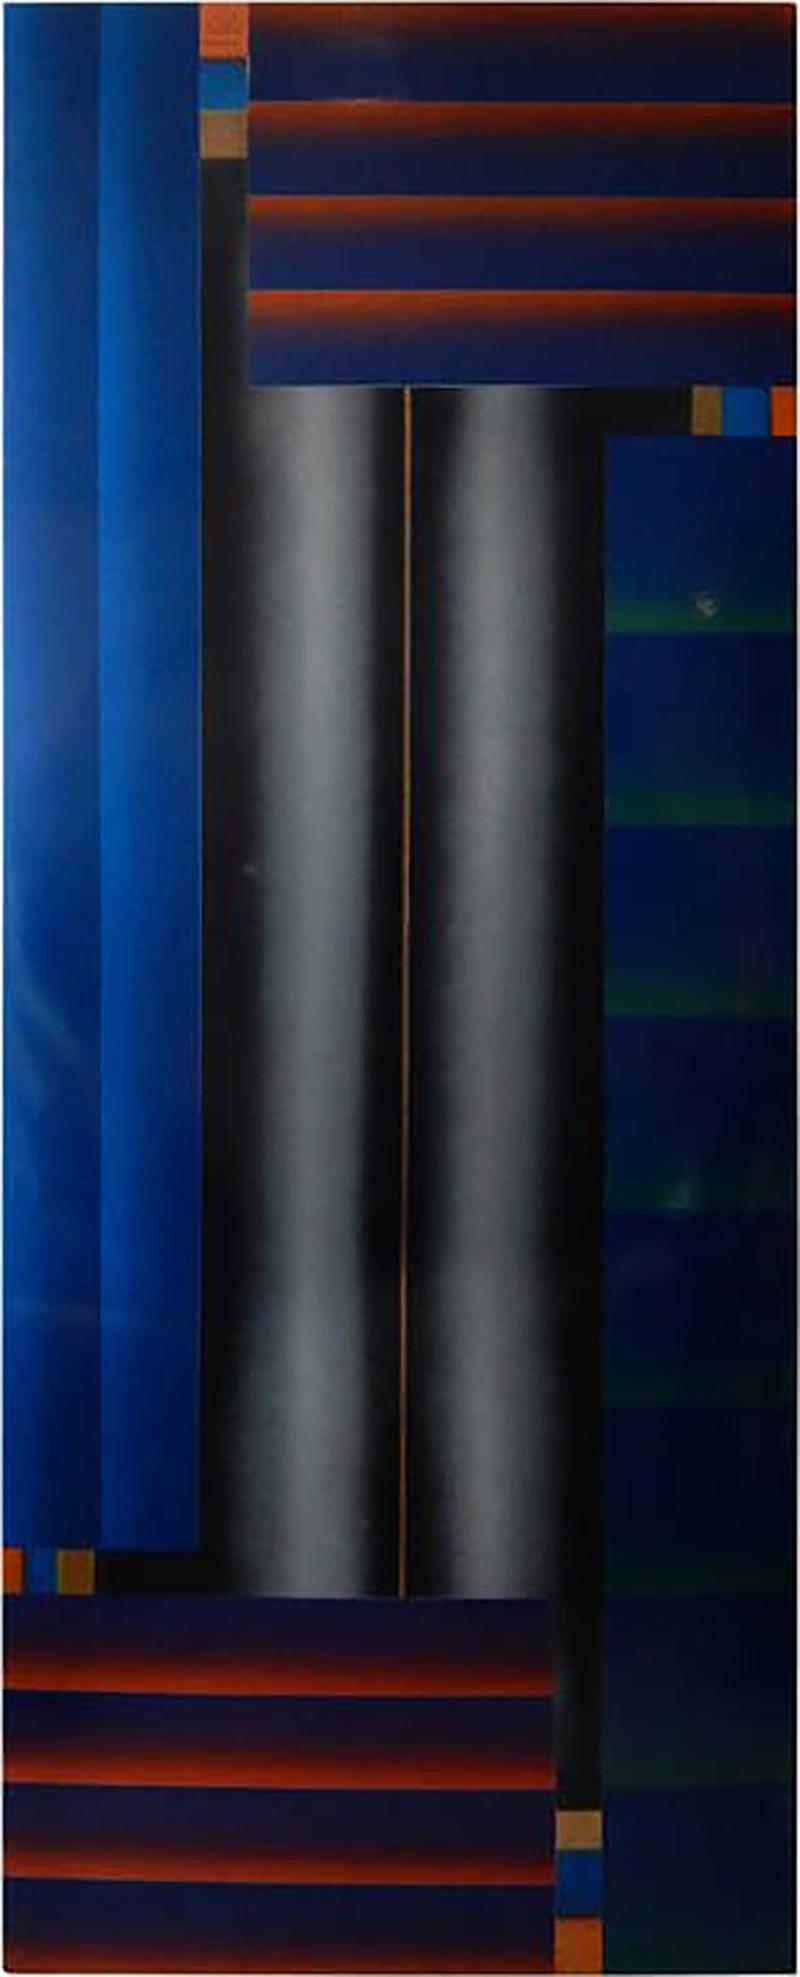 Stefan Knapp Monumental Modernist Enamel on Metal Painting by Stefan Knapp